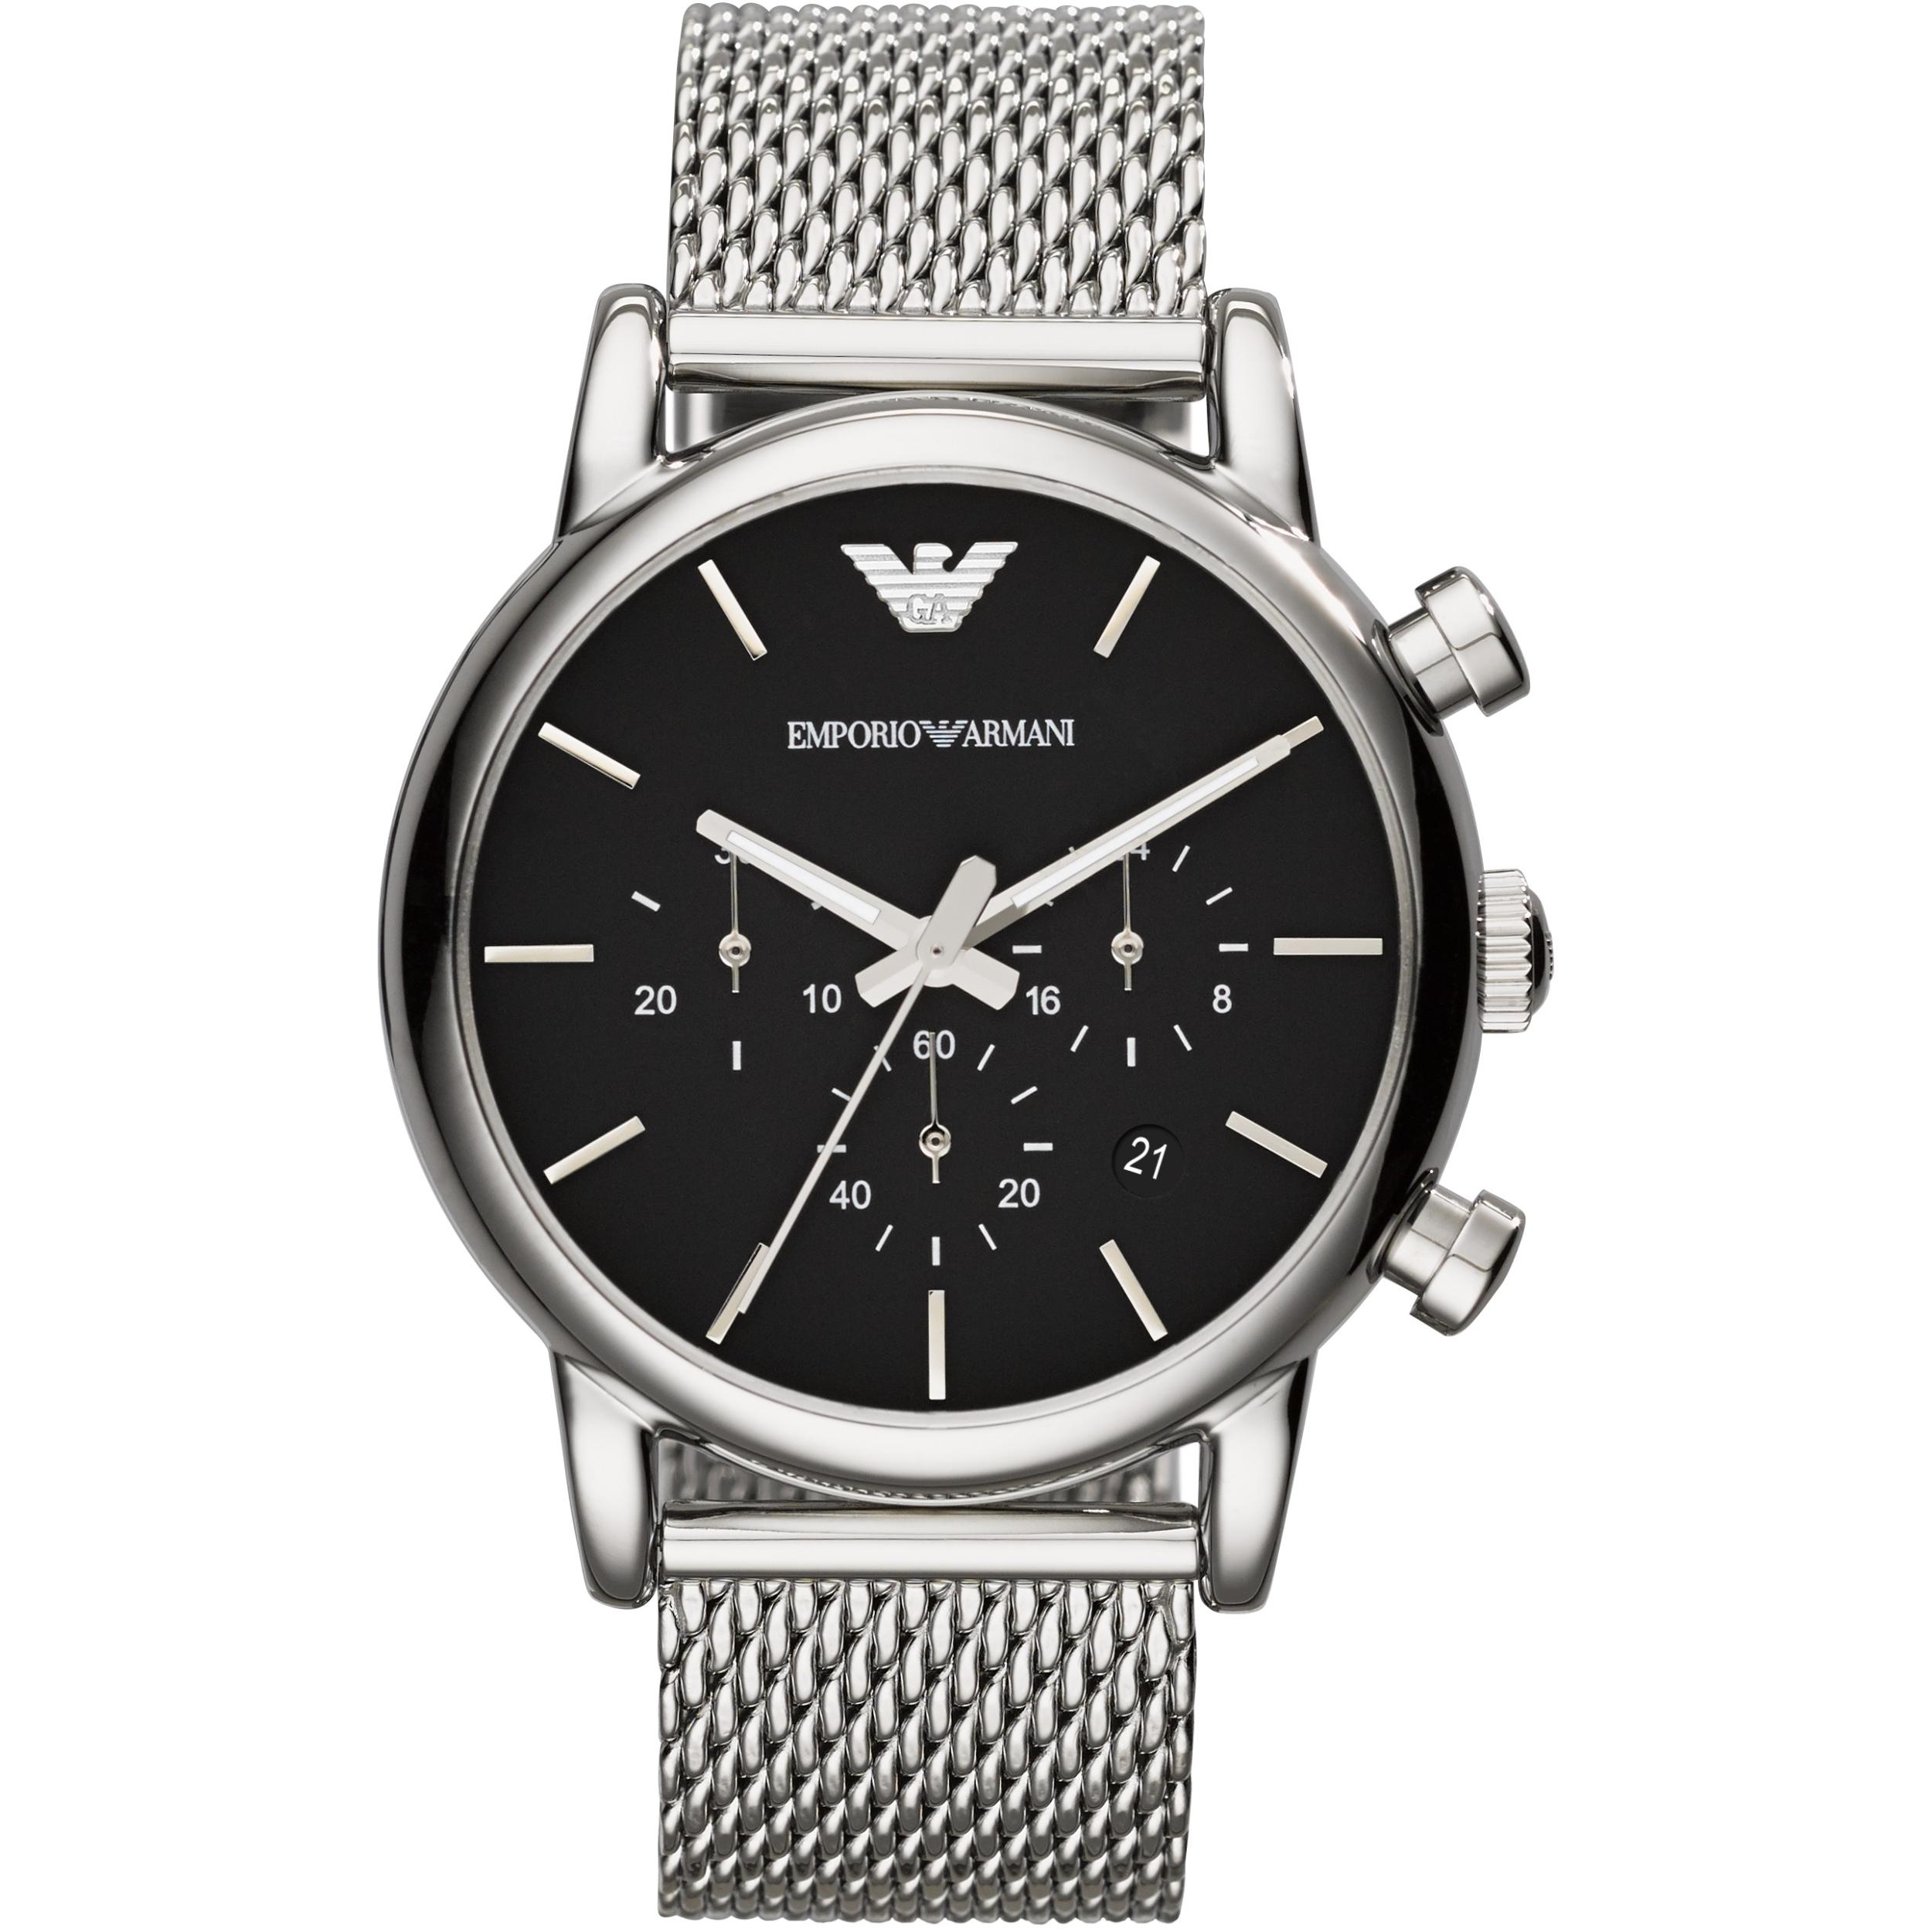 Montre Chronographe Homme Emporio Armani AR1811   FR   Watch Shop™ ced7b62ad6b0